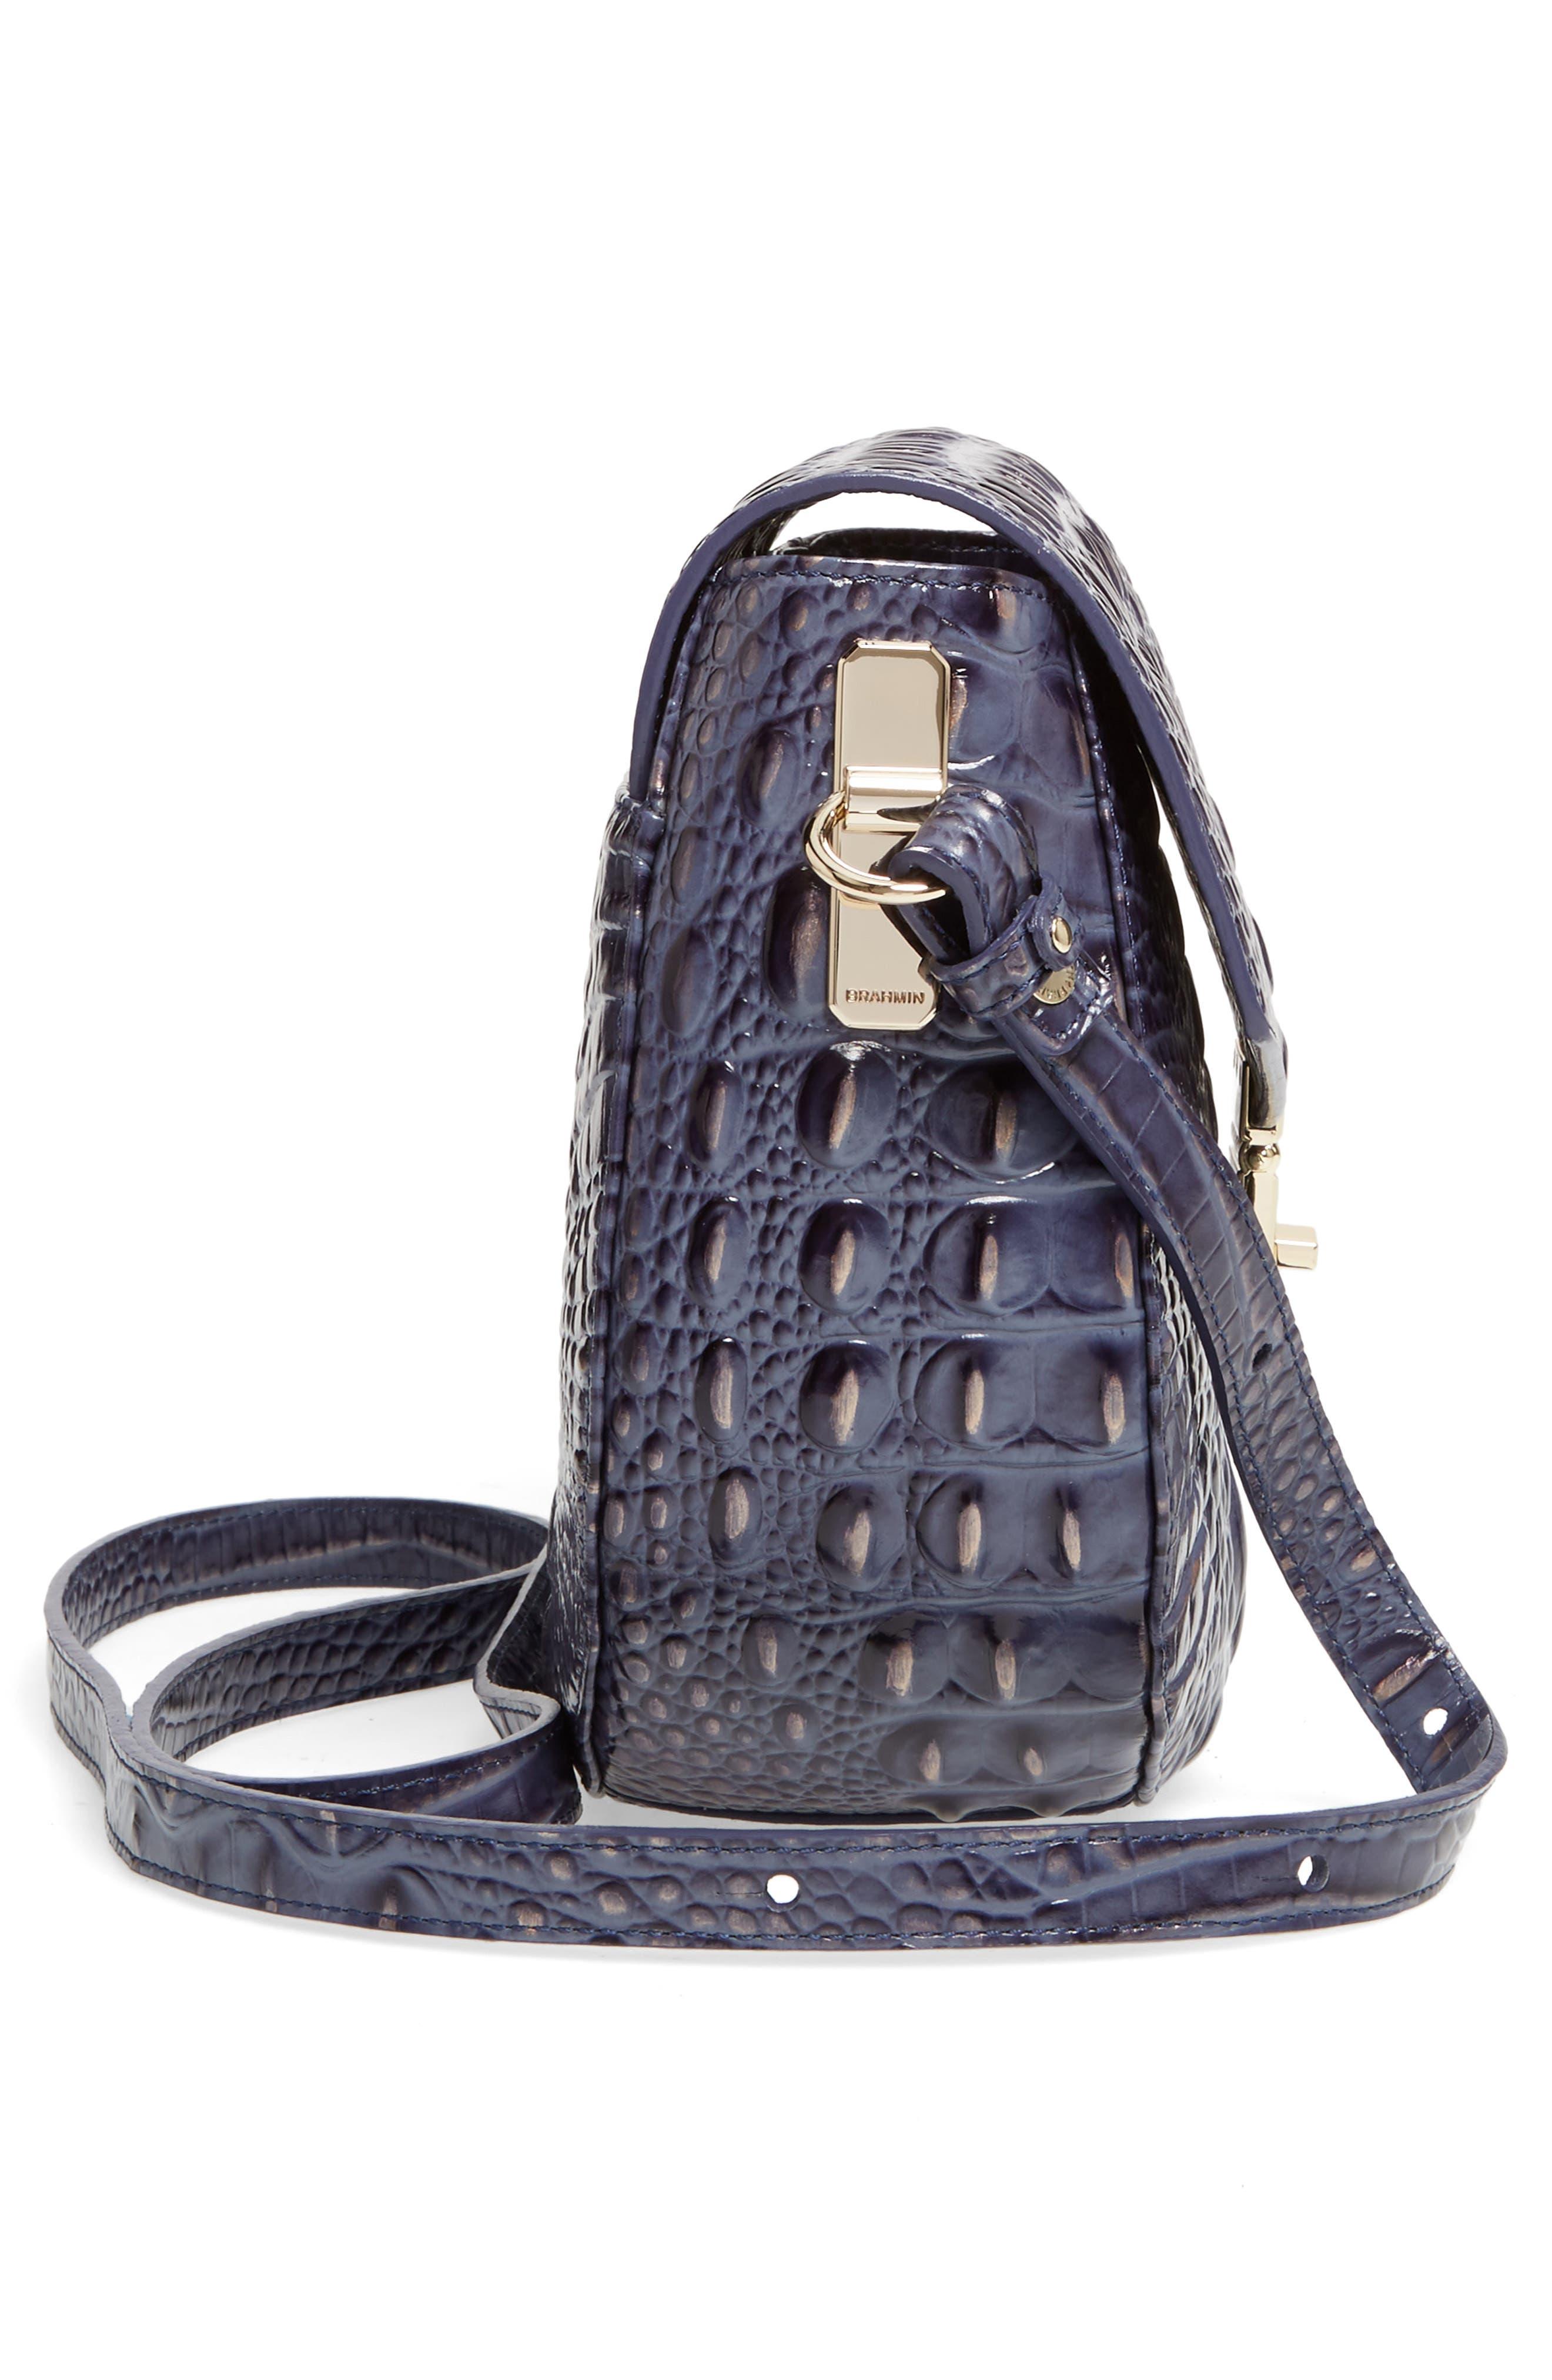 Melbourne - Lizzie Leather Crossbody Bag,                             Alternate thumbnail 24, color,